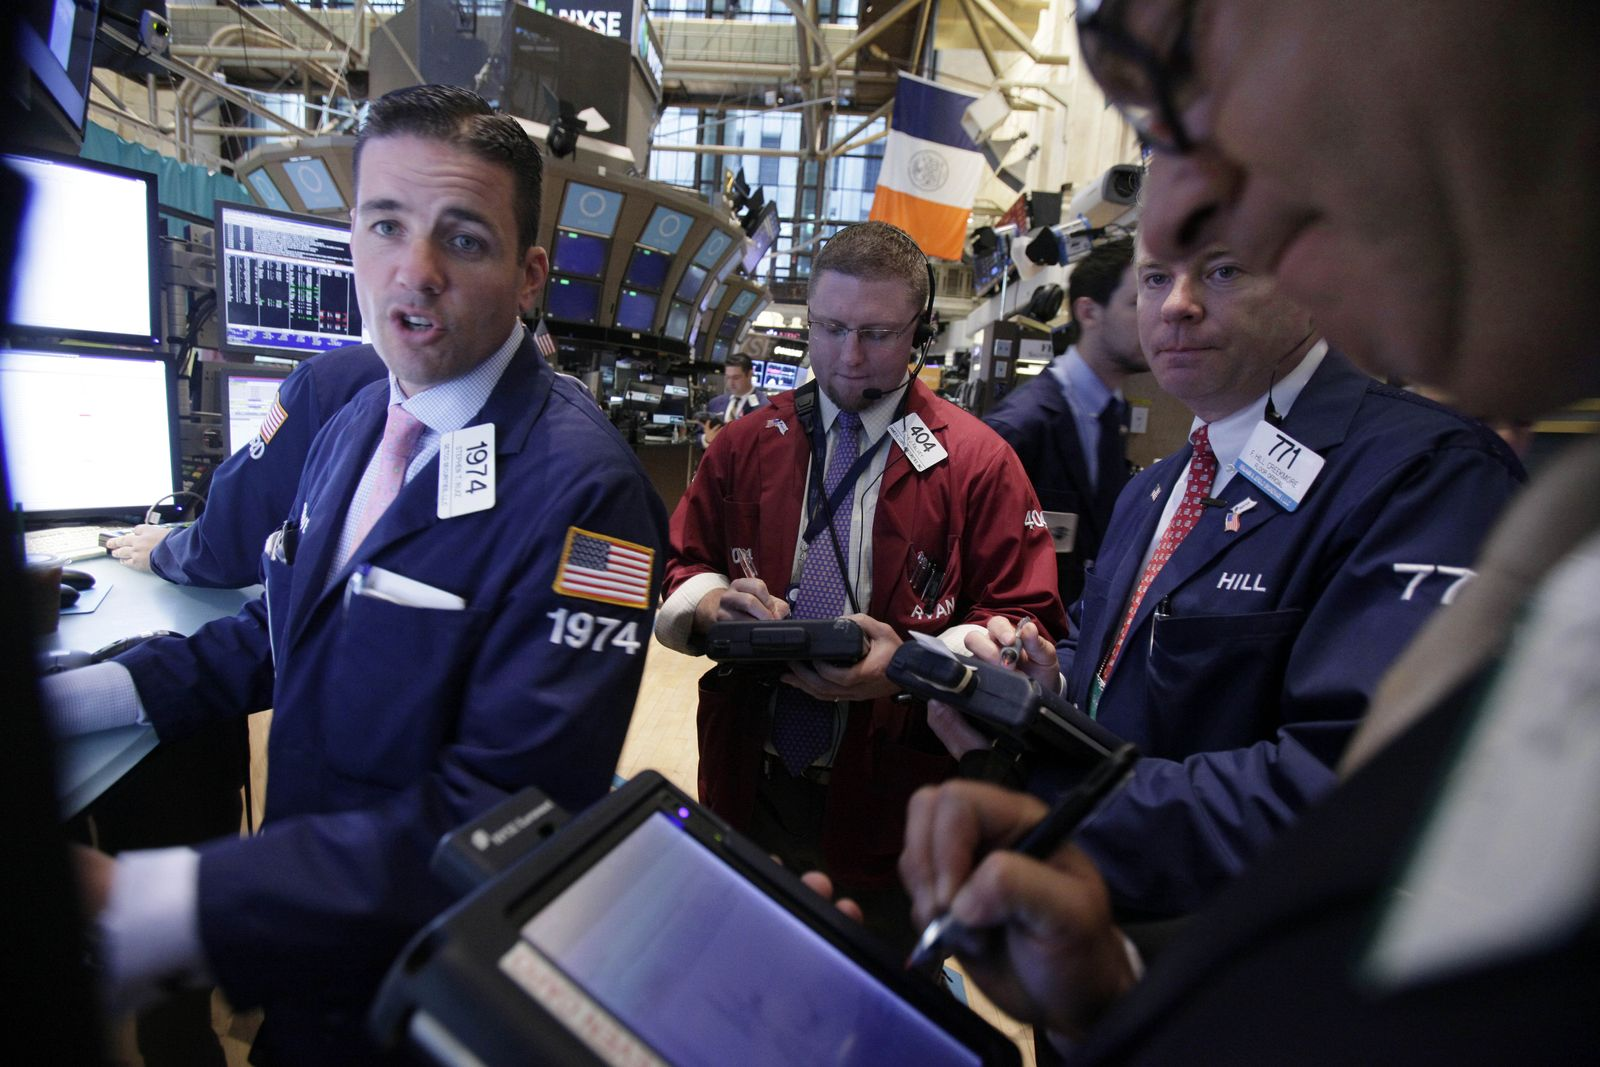 Börse / Wall Street / New York Stock Exchange